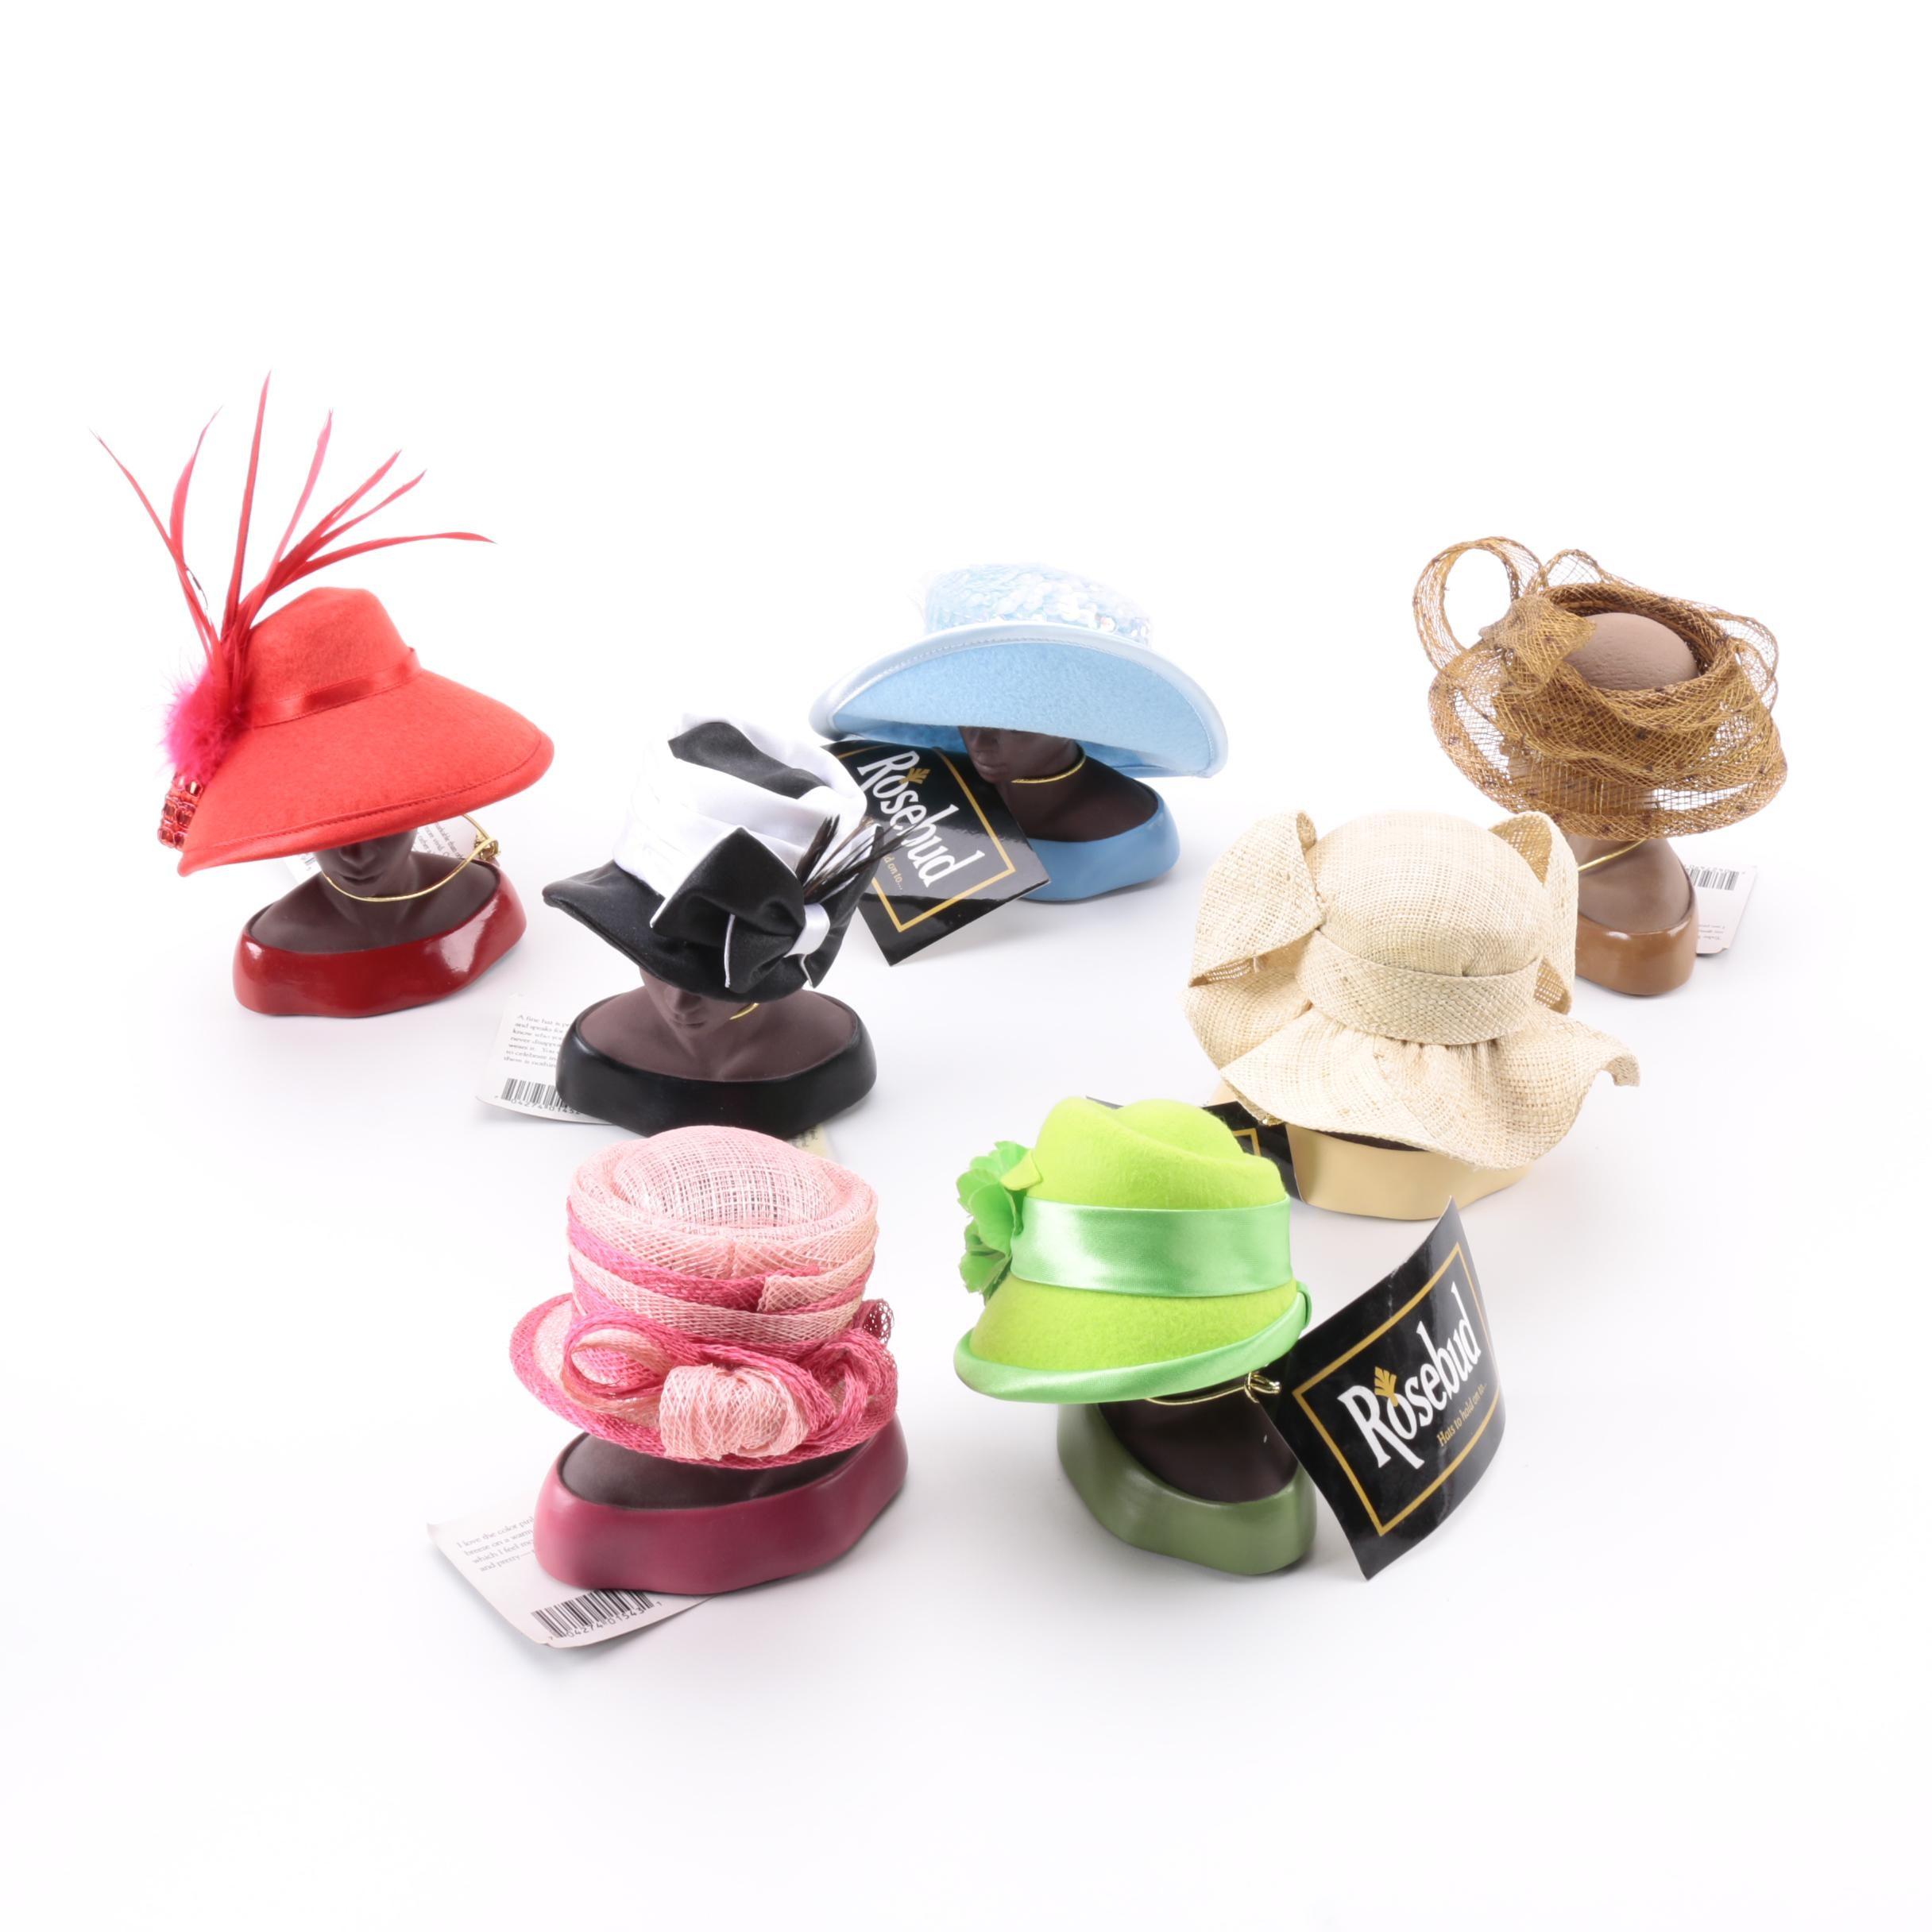 Harriet Rosebud Miniature Hats on Busts